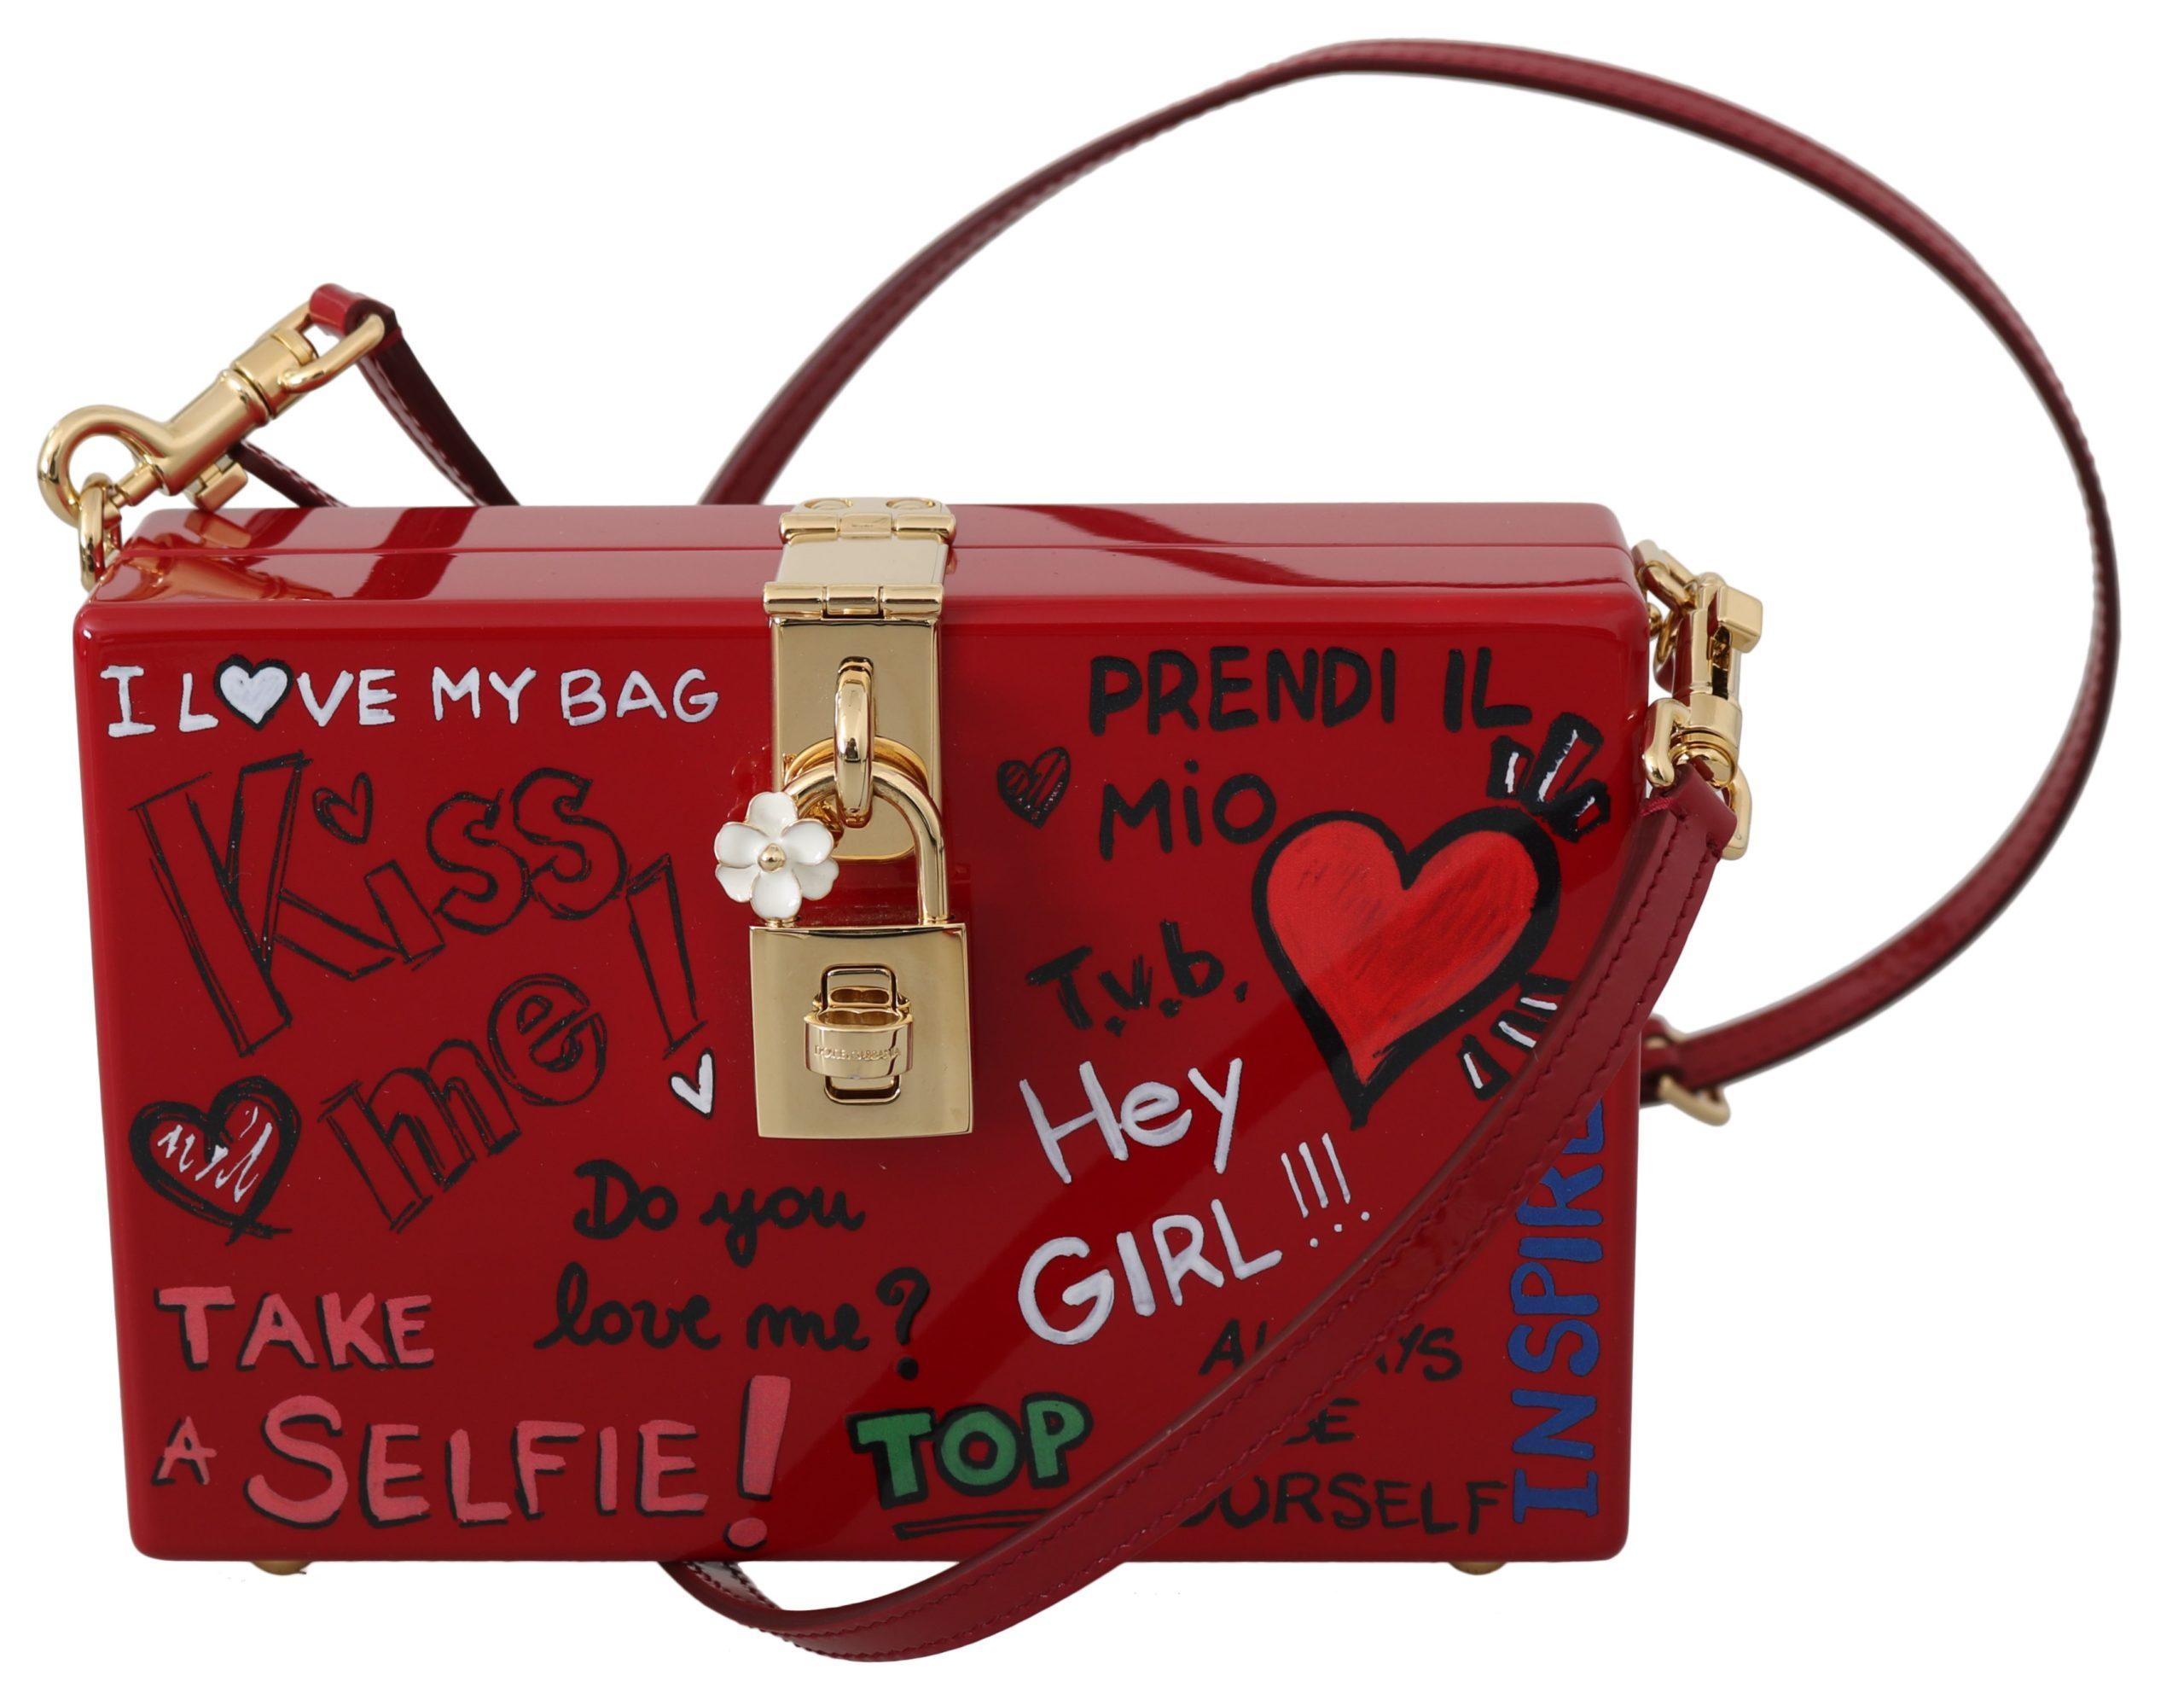 Dolce & Gabbana Women's Hand Painted Wooden Leather Shoulder Bag Red VAS8724